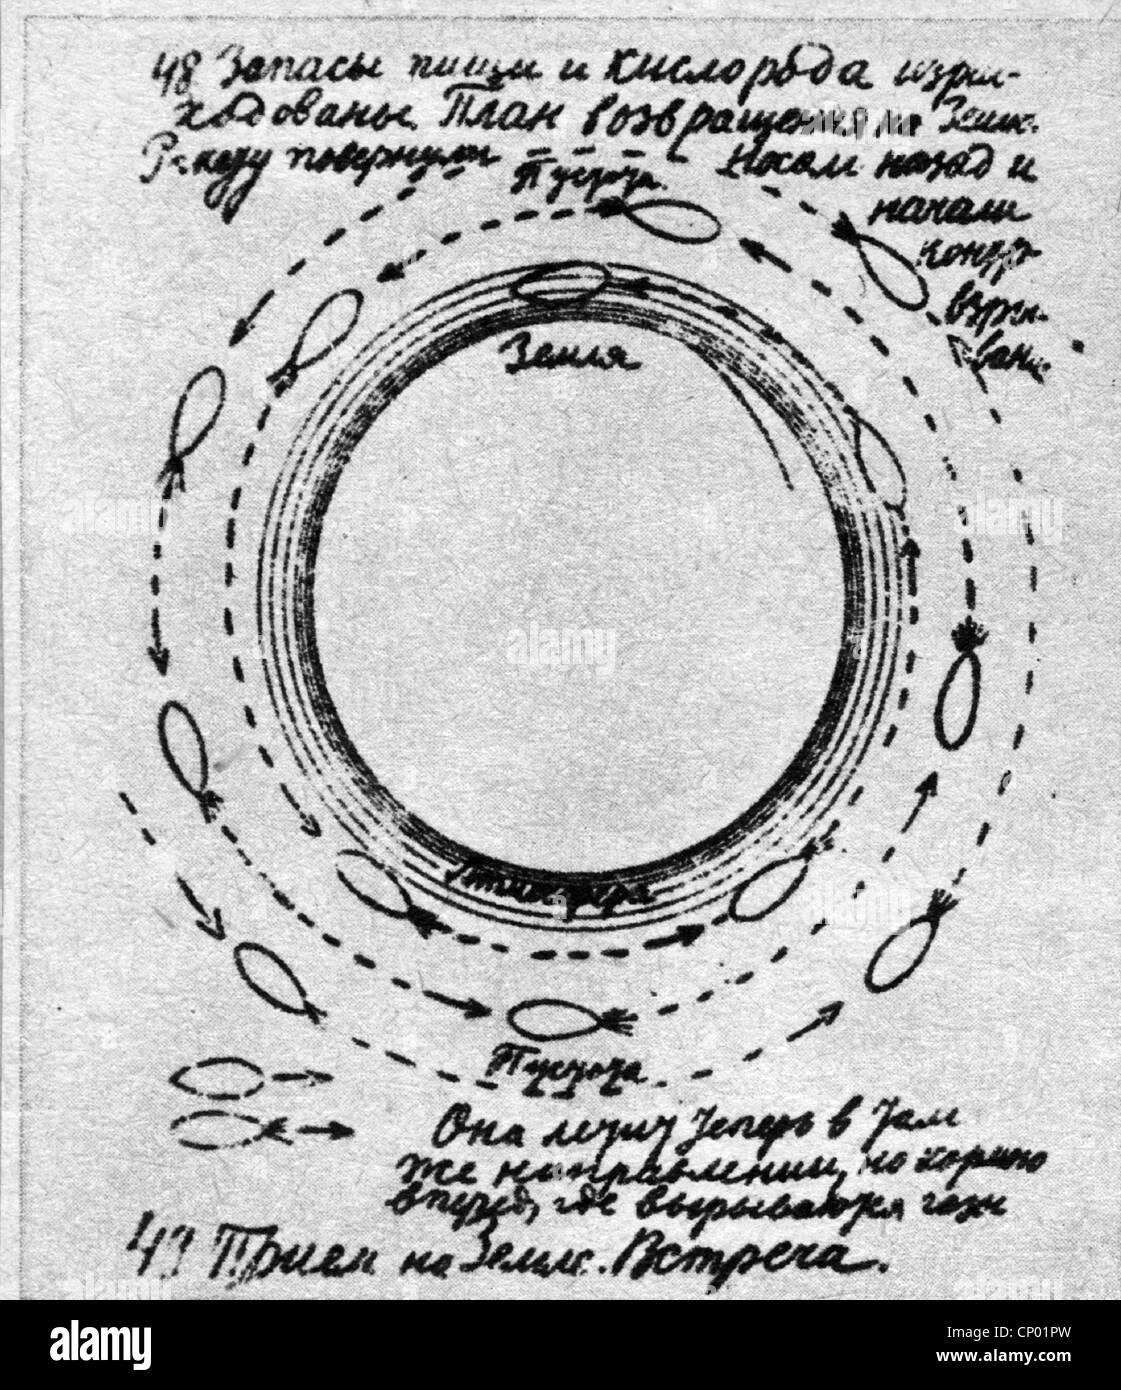 Tsiolkovskii, Konstantin Eduardovich, 17.9.1857 - 19.9.1935, russischer Physiker, Mathematikhistoriker, Seite aus Stockfoto